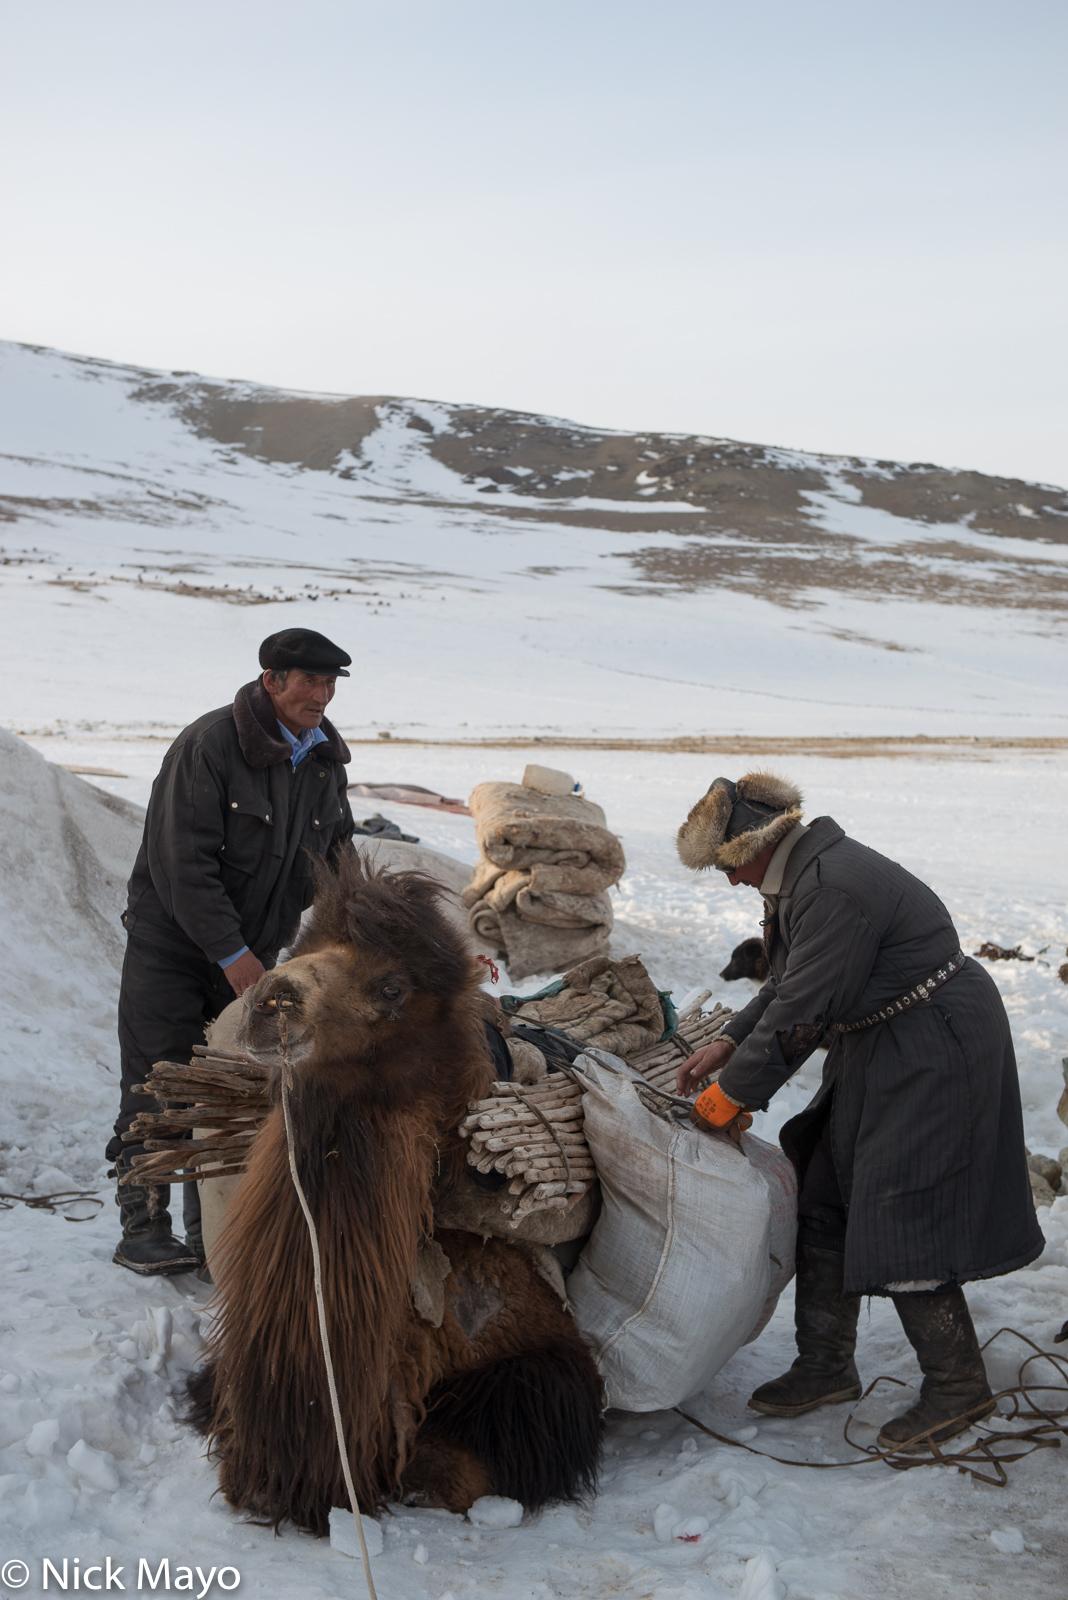 Bayan-Ölgii, Camel, Kazakh, Mongolia, Pack Animal, photo